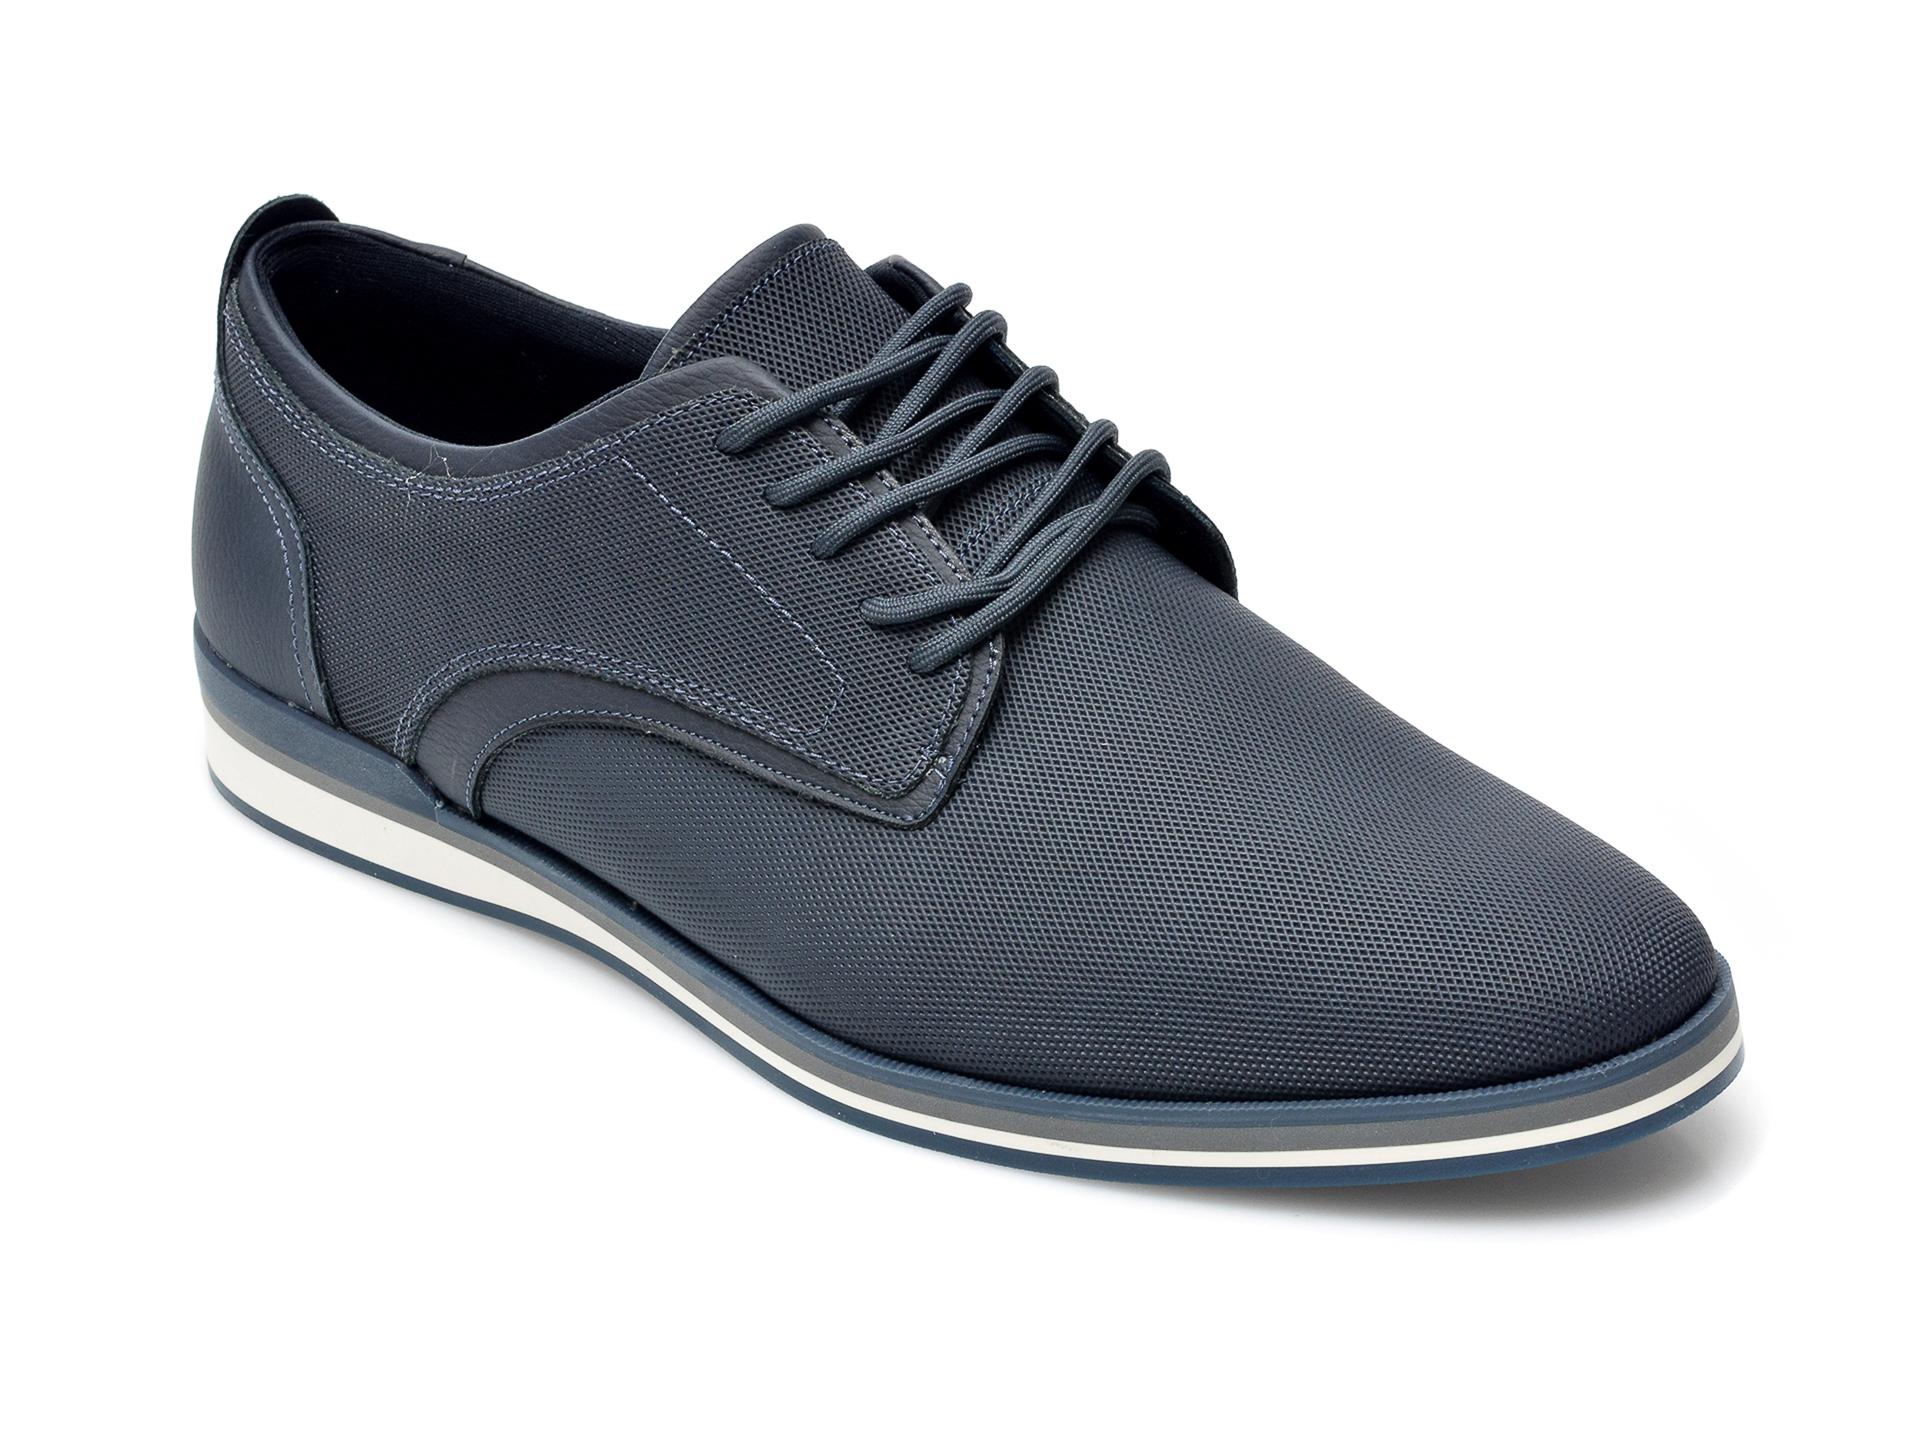 Pantofi ALDO bleumarin, Eowoalian410, din piele ecologica imagine otter.ro 2021